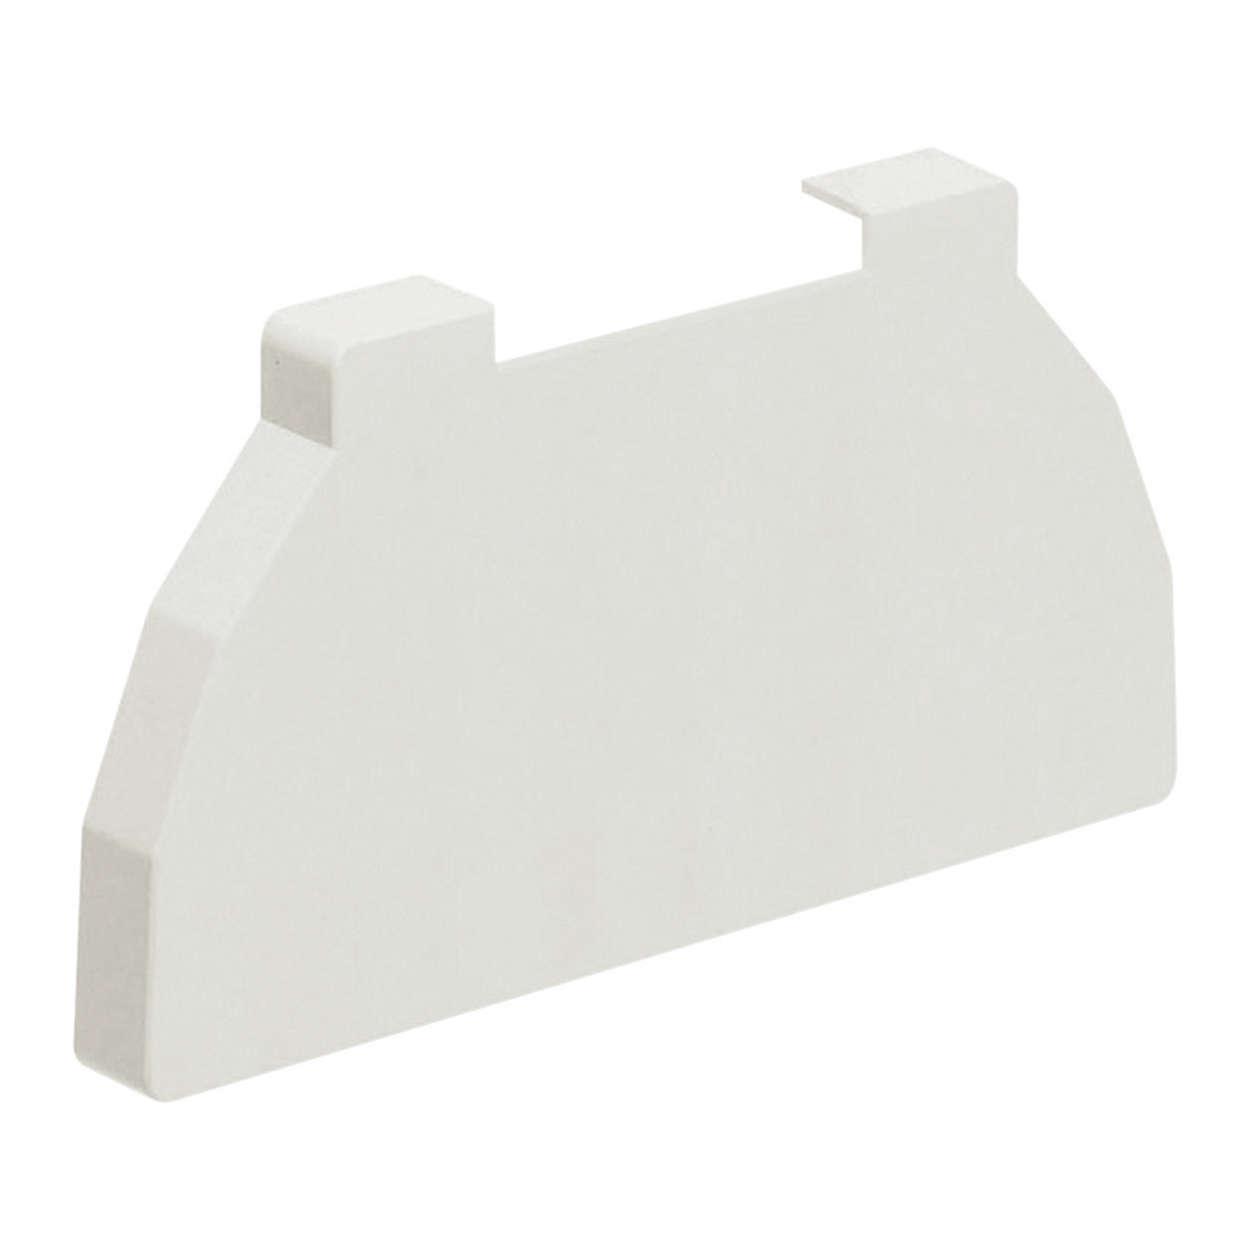 GMX450 TL-D réflecteur universel